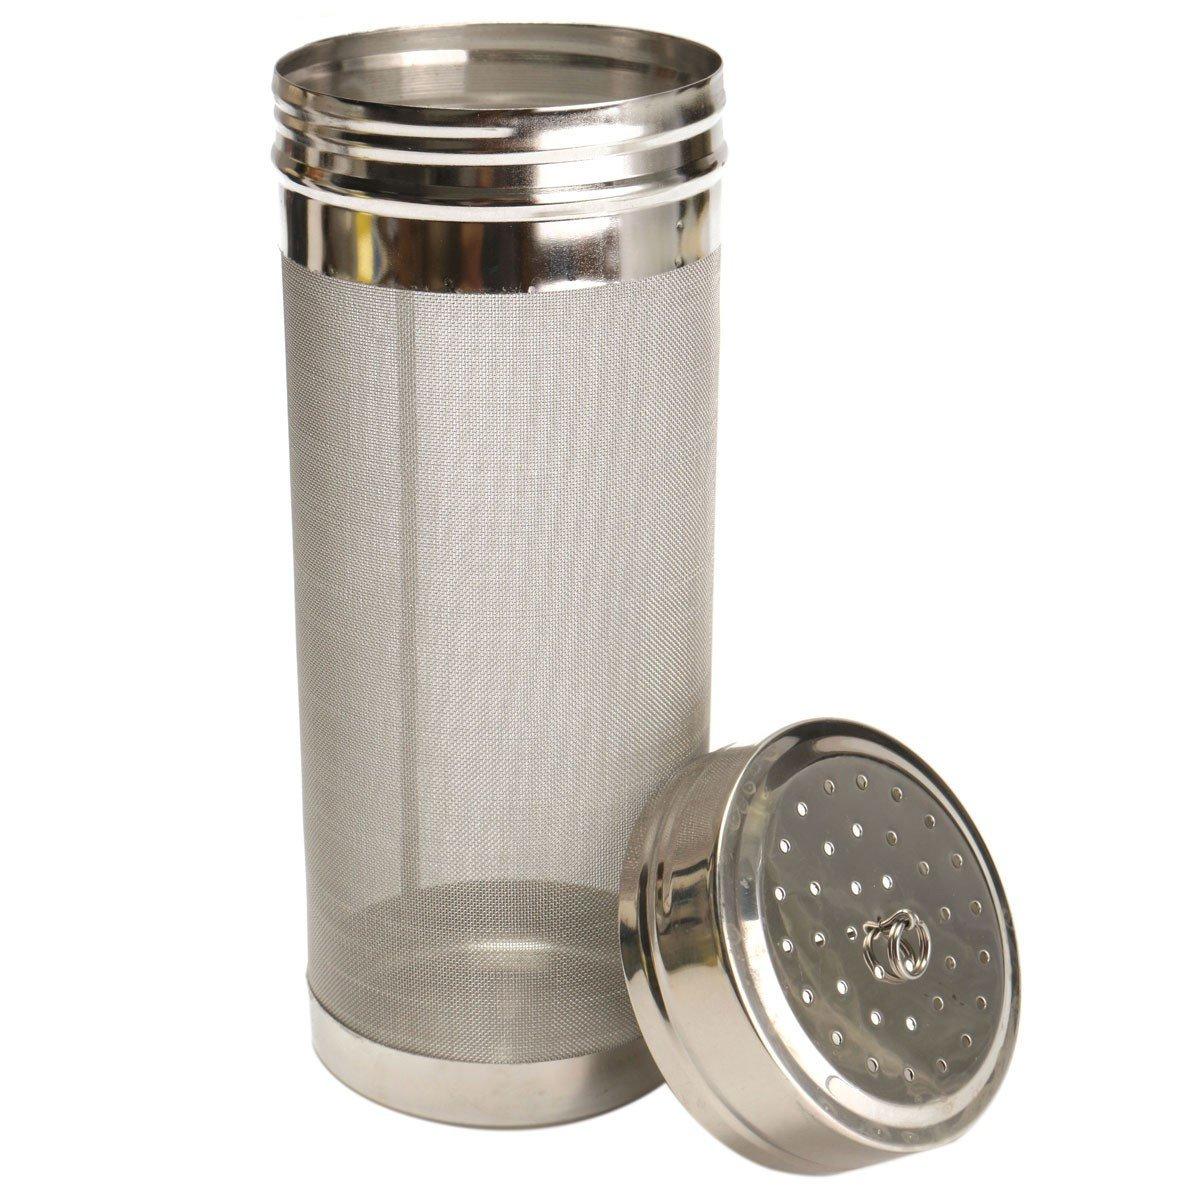 Mesh Stainless Steel Hop Filter Strainer 70x180mm Home Beer Wine Brew Pellet Hop Filter Filtering Brew Kettle Barware Tools Kangsanli